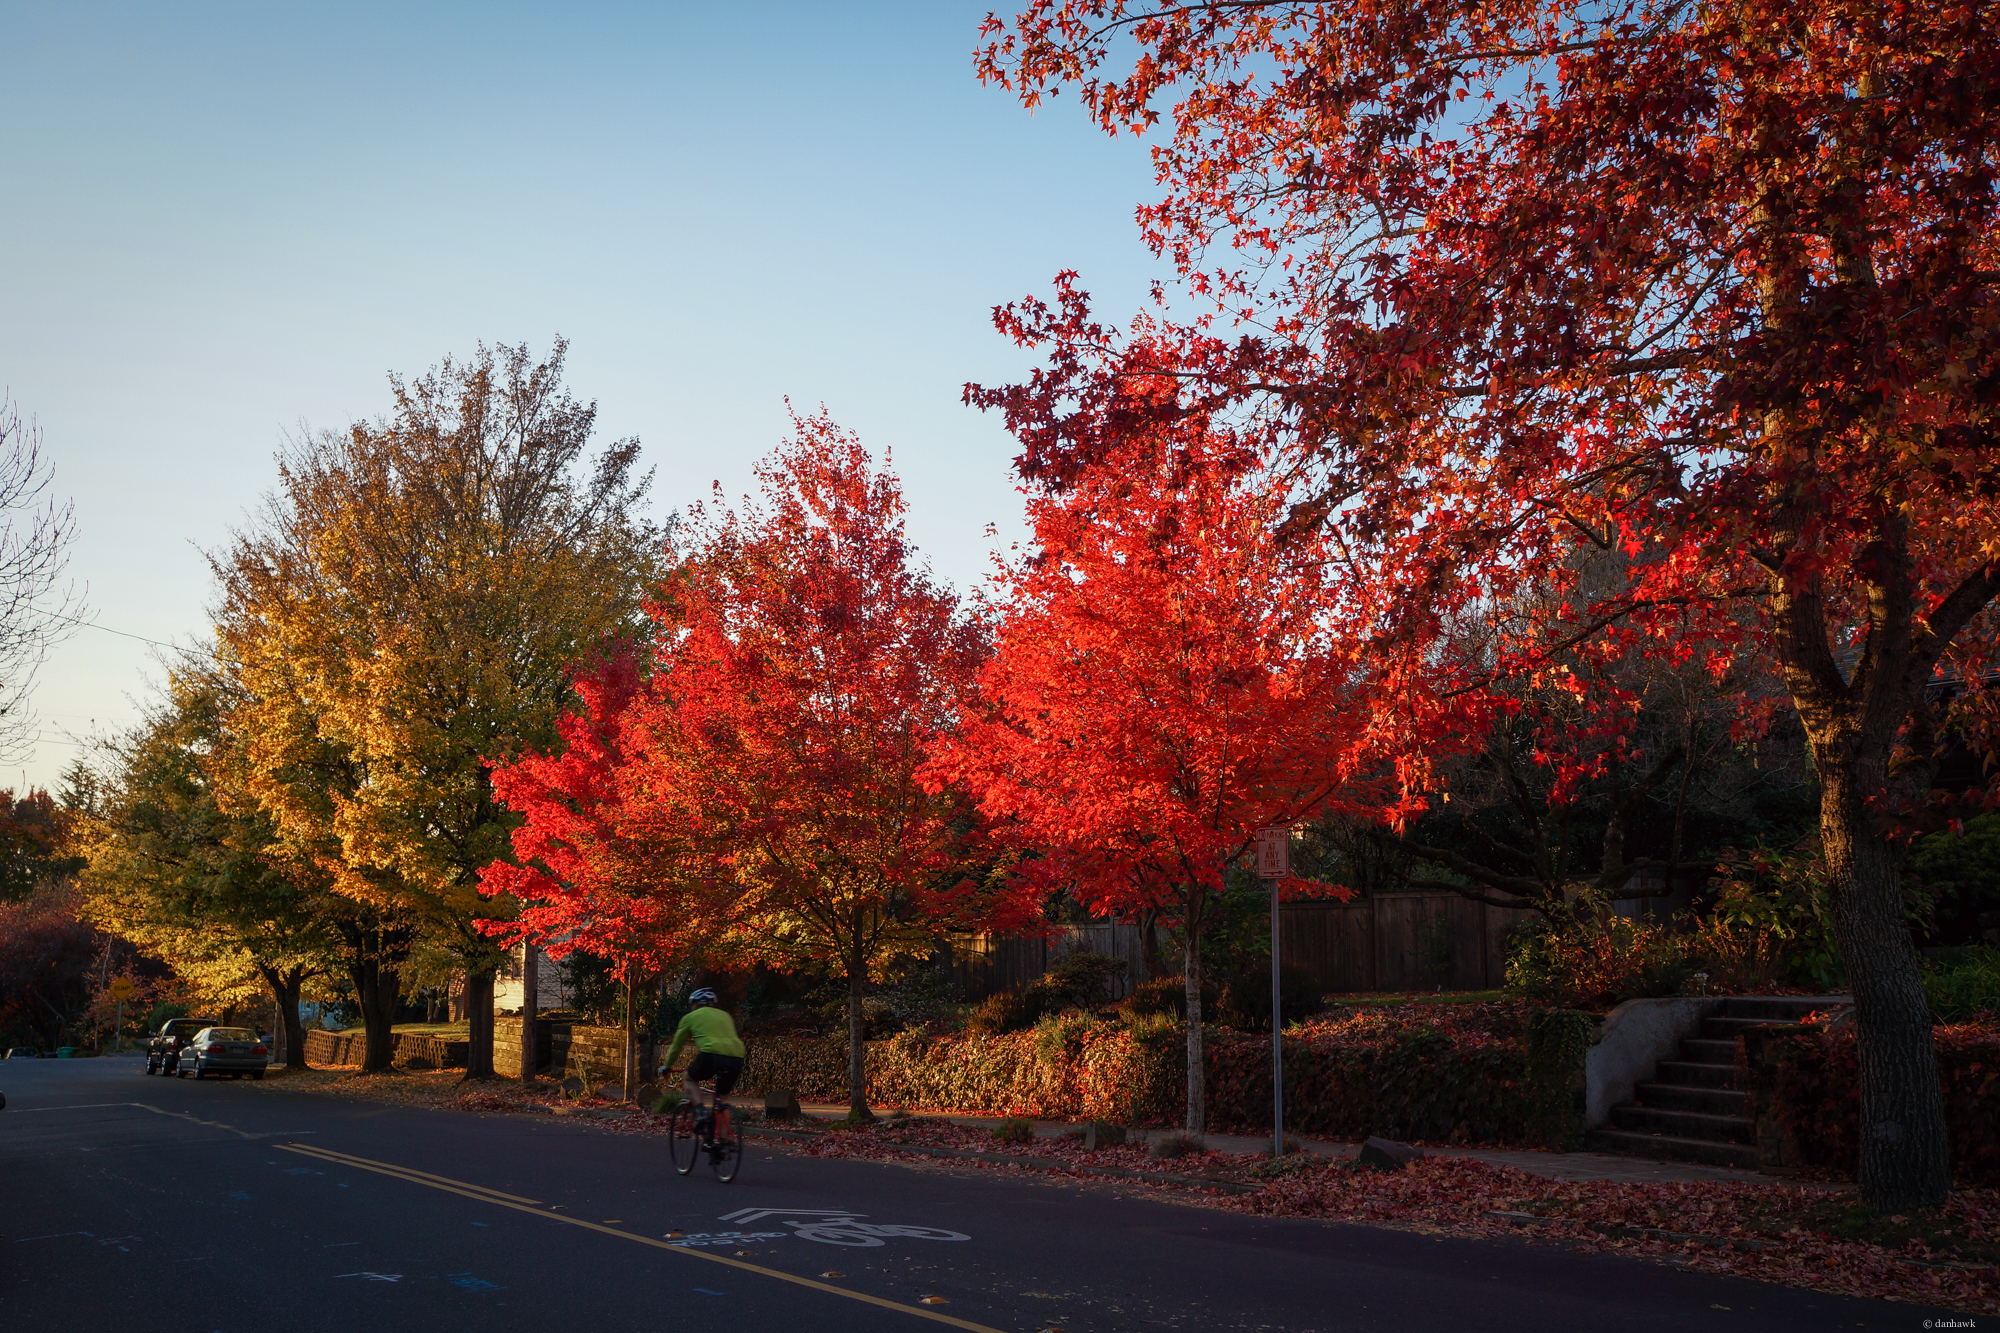 Fall Bike Commute | 24mm, f/5, ISO 100, 1/125